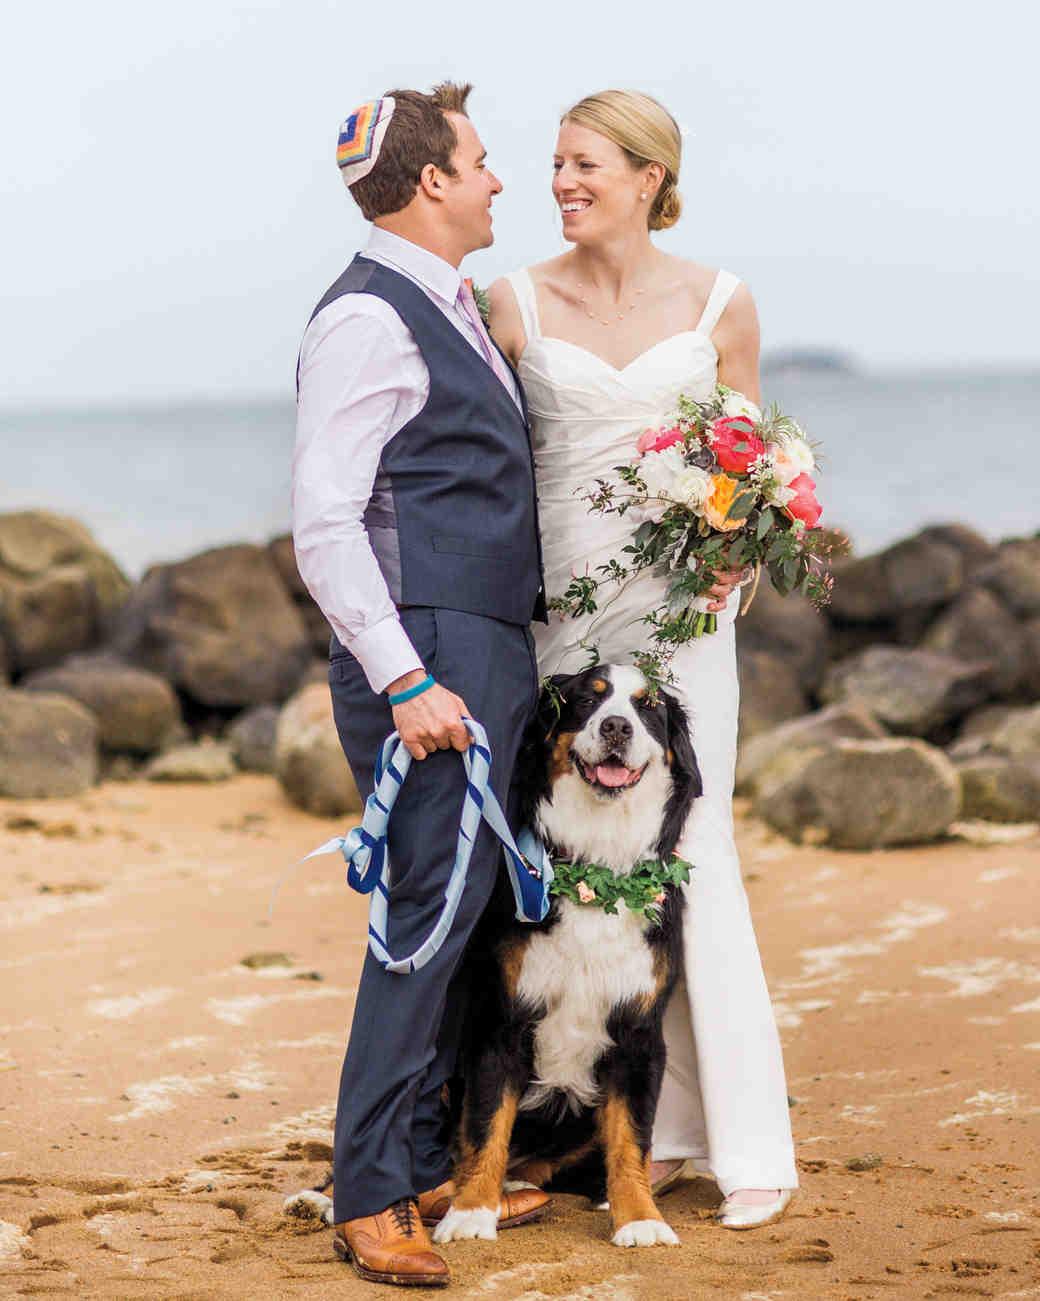 emily-justin-wedding-cape-cod-306-s111843.jpg